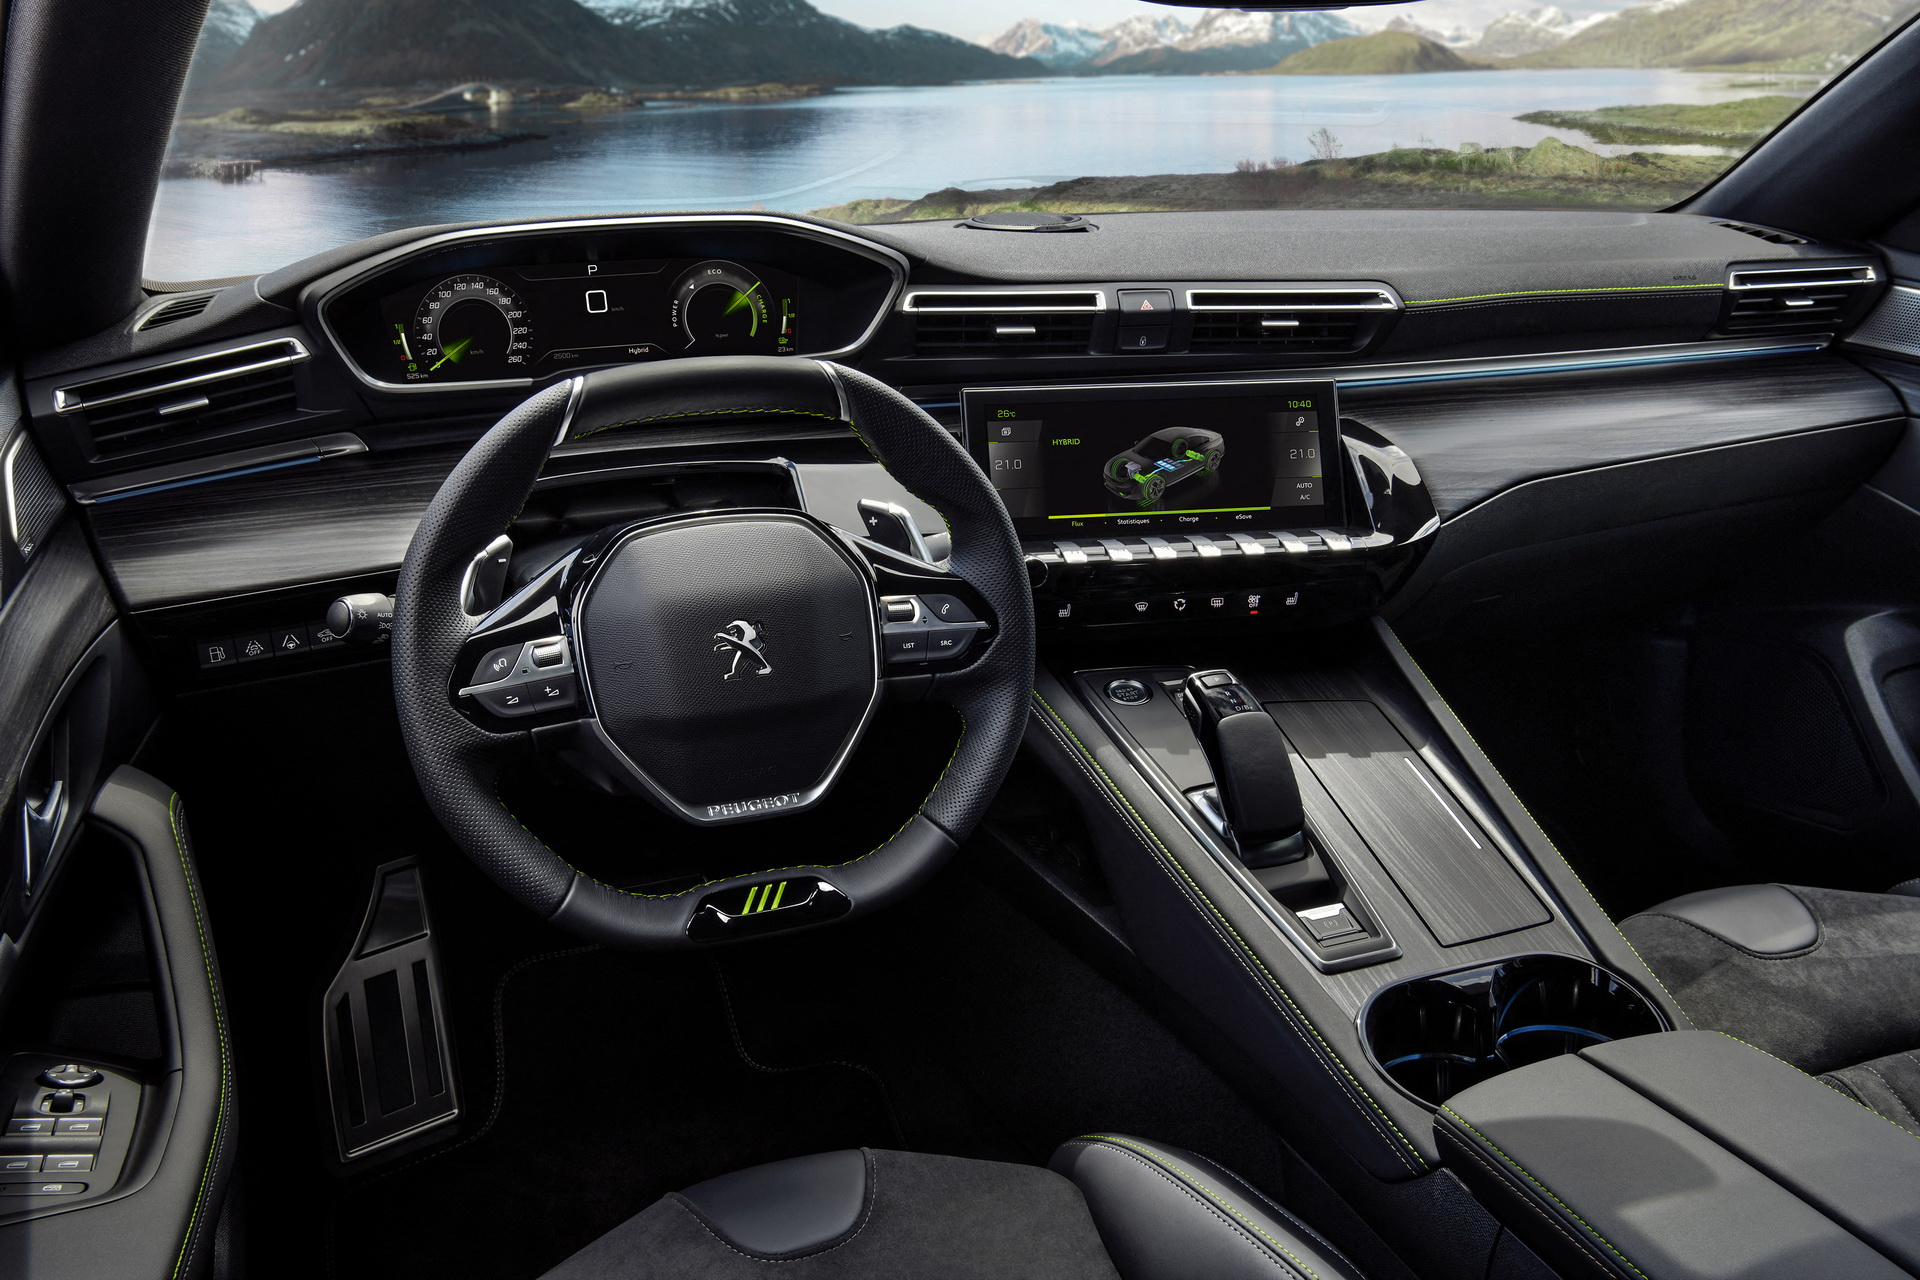 Peugeot 508 PSE - interior